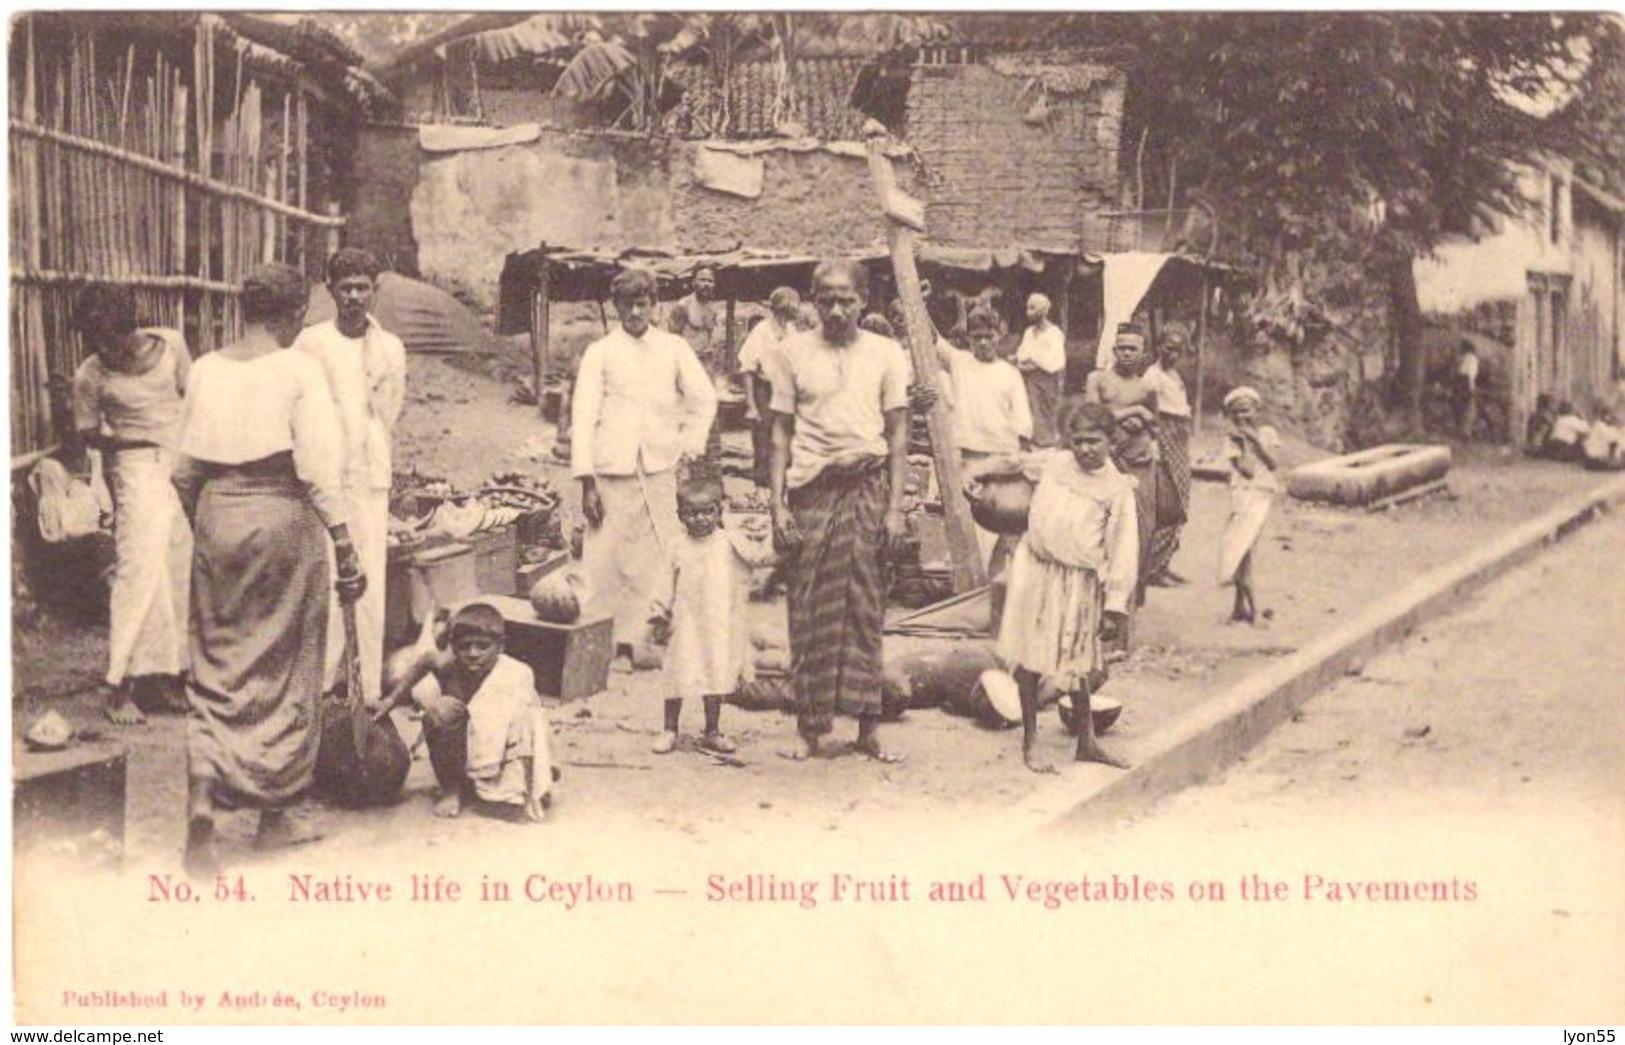 Native Life In Ceylon Selling Fruit And Vegetables On The Pavements - Sri Lanka (Ceylon)